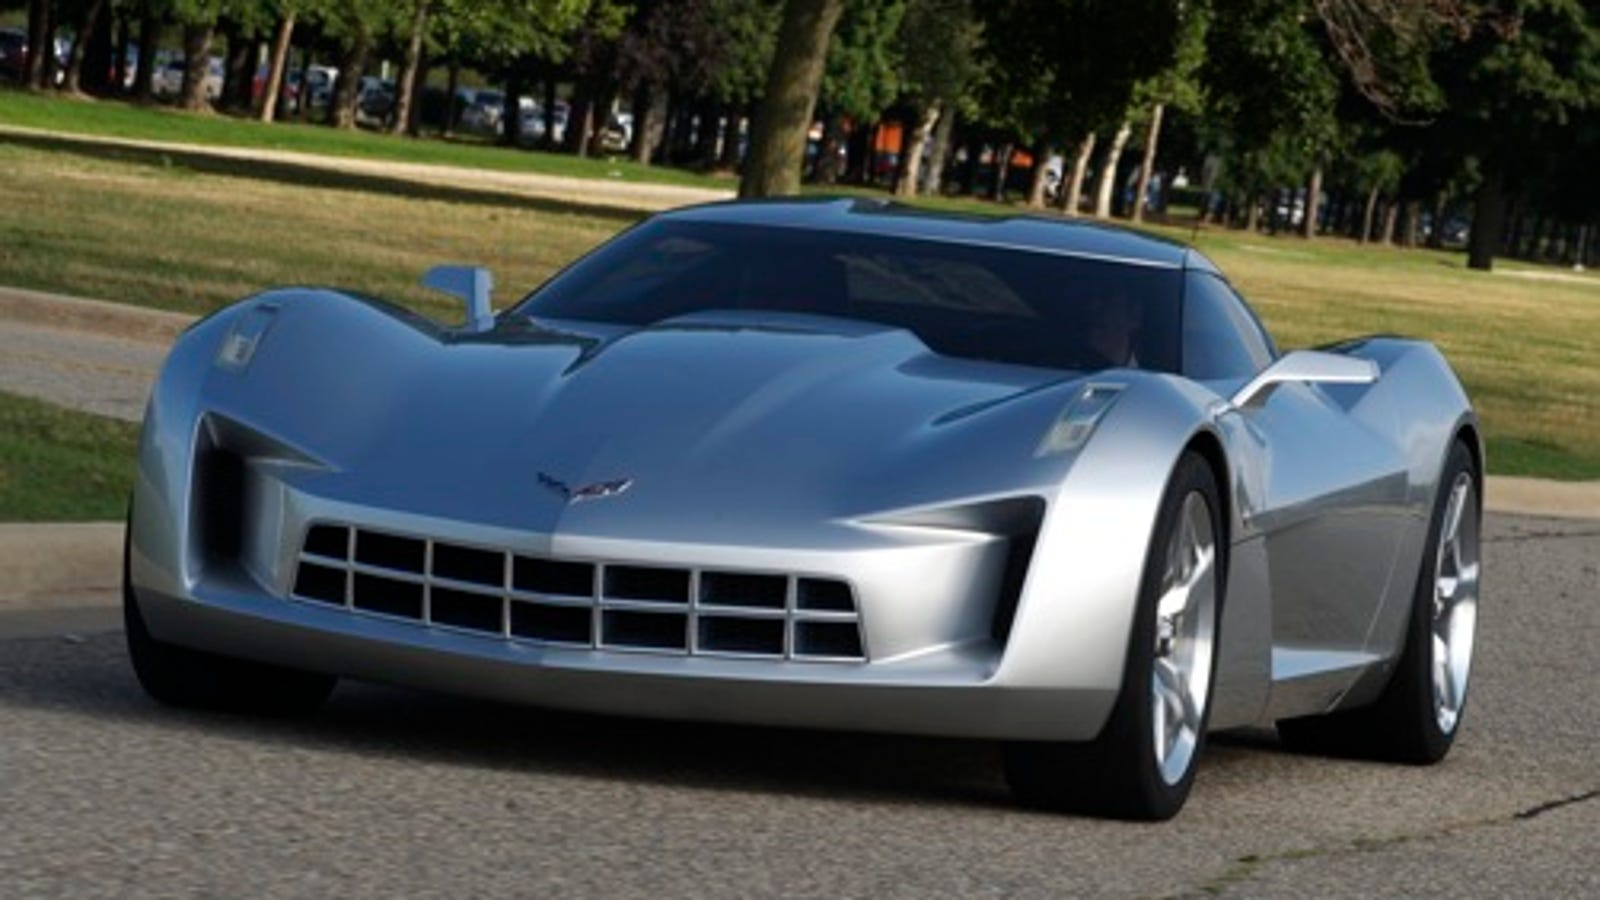 Stingray Concept: Transformers Corvette A High-Tech Hybrid ...